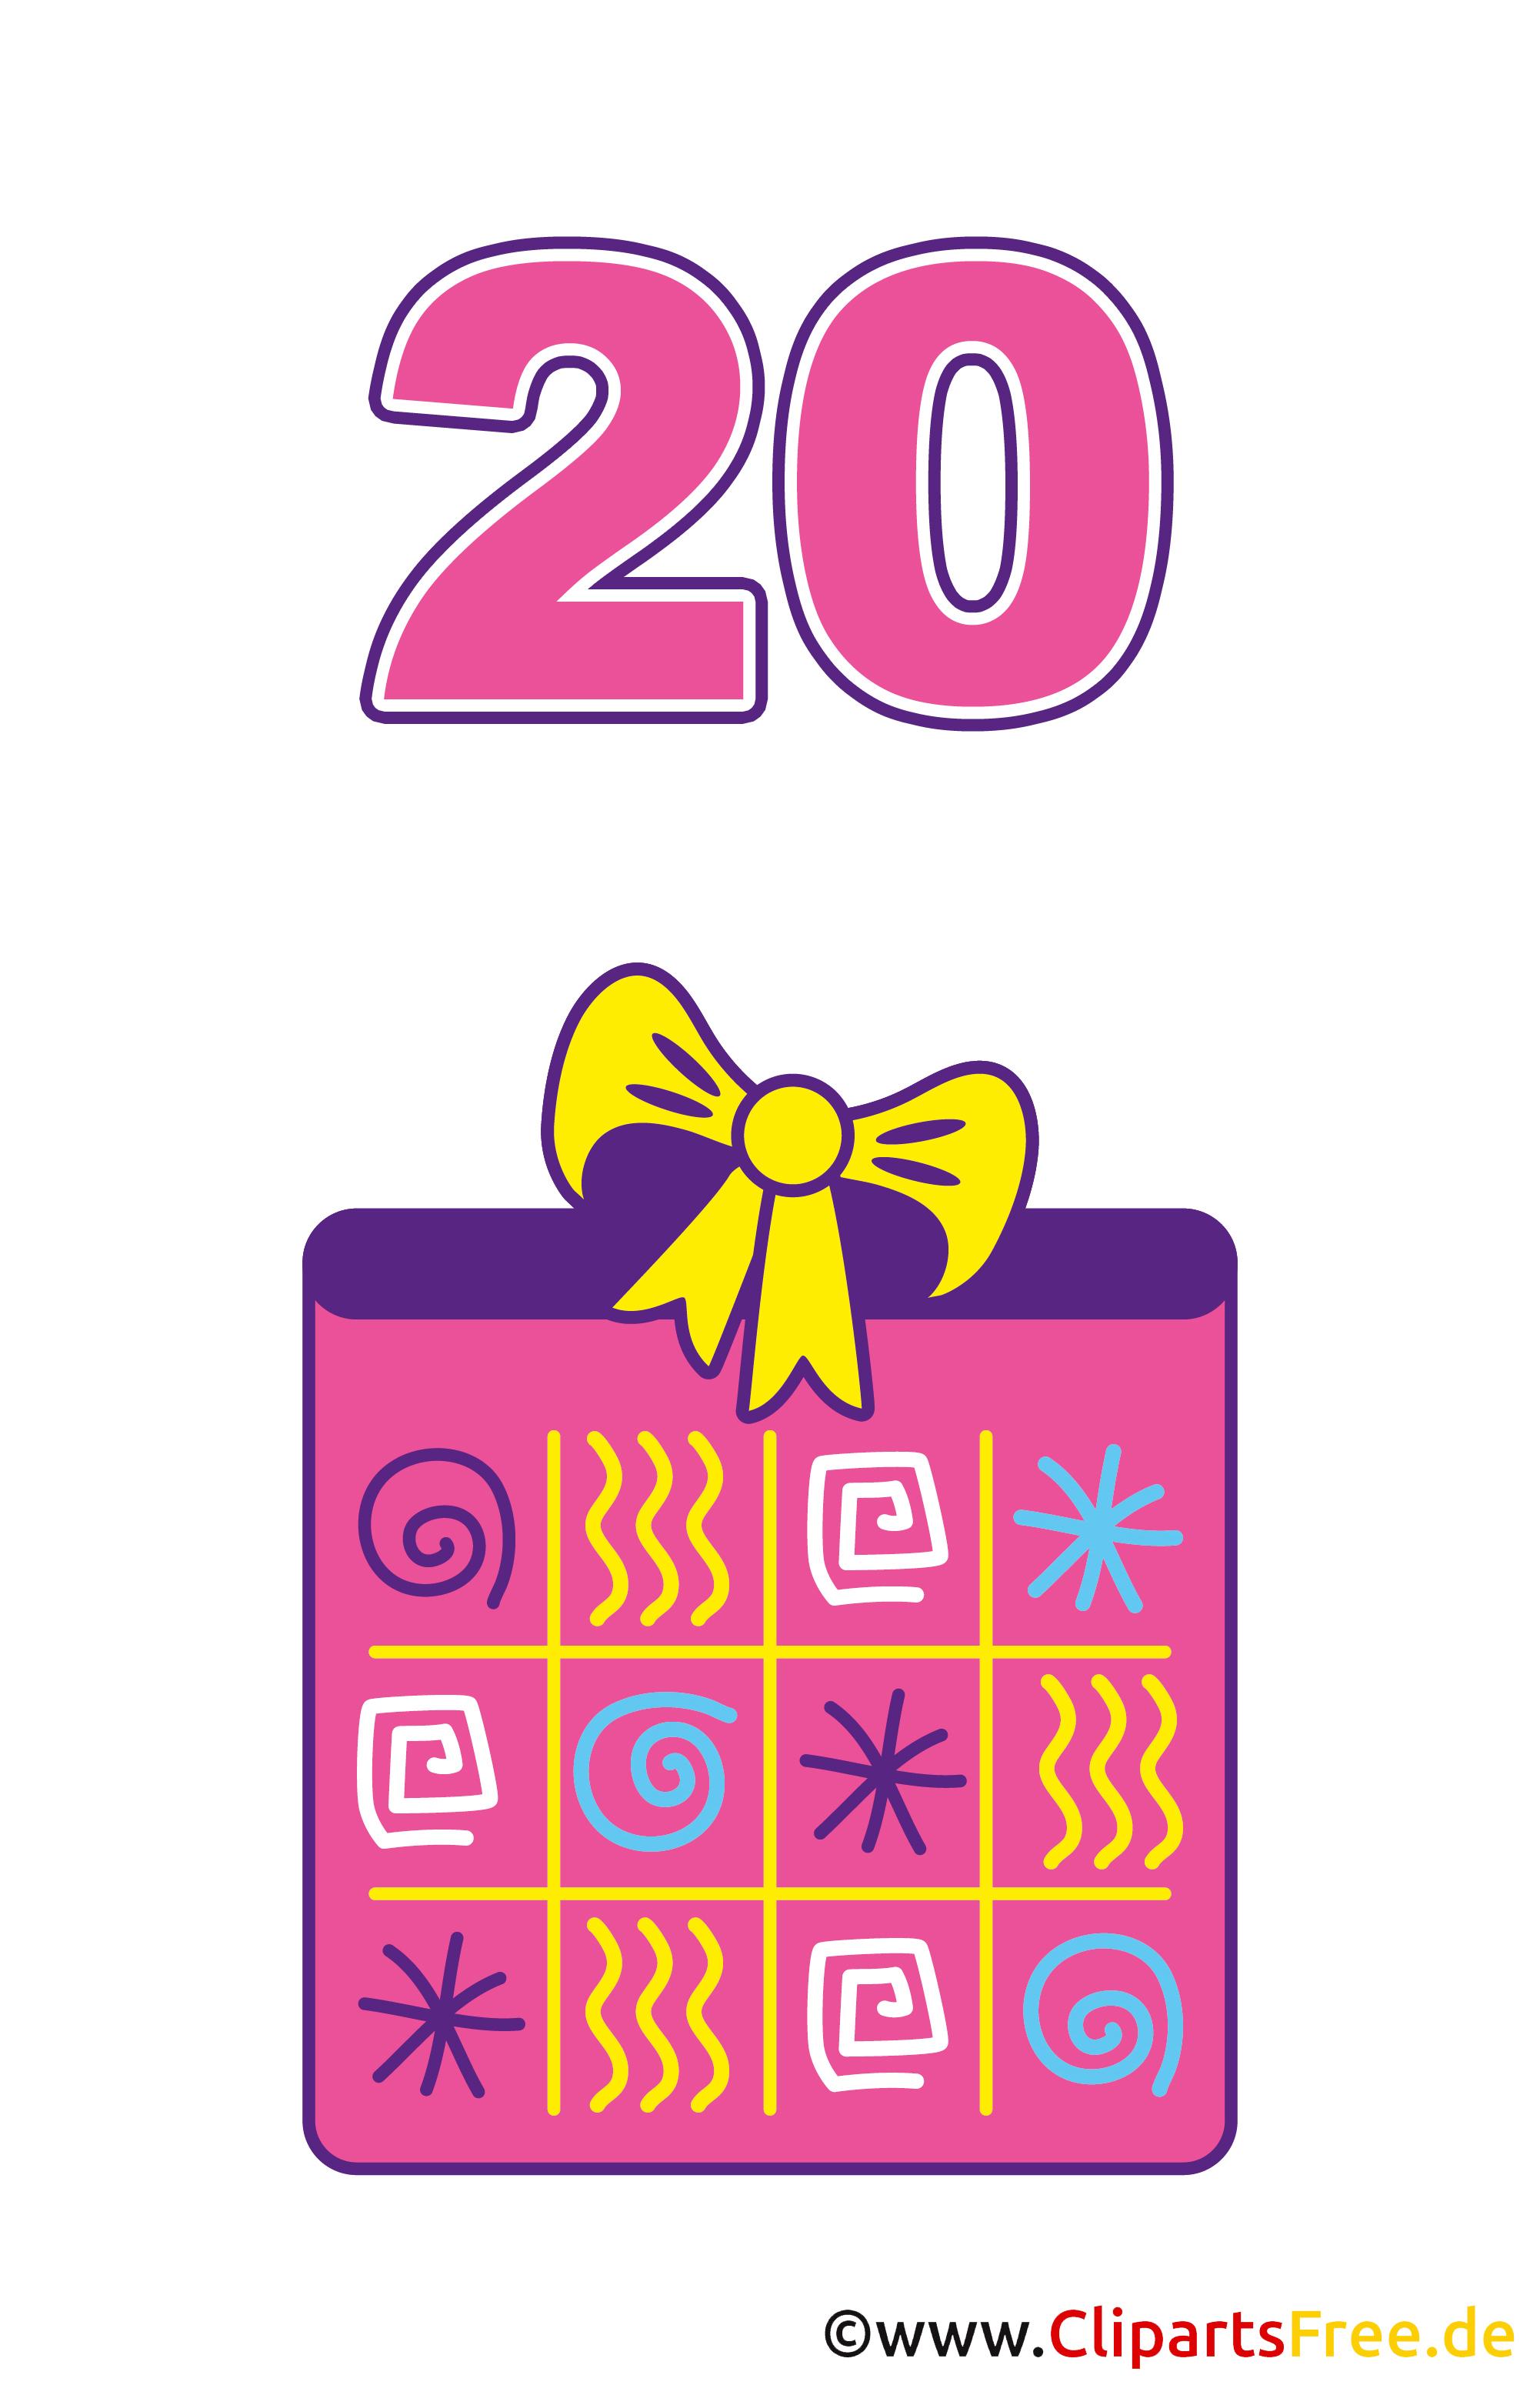 Geschenk zum 20 Geburtstag Clipart gratis